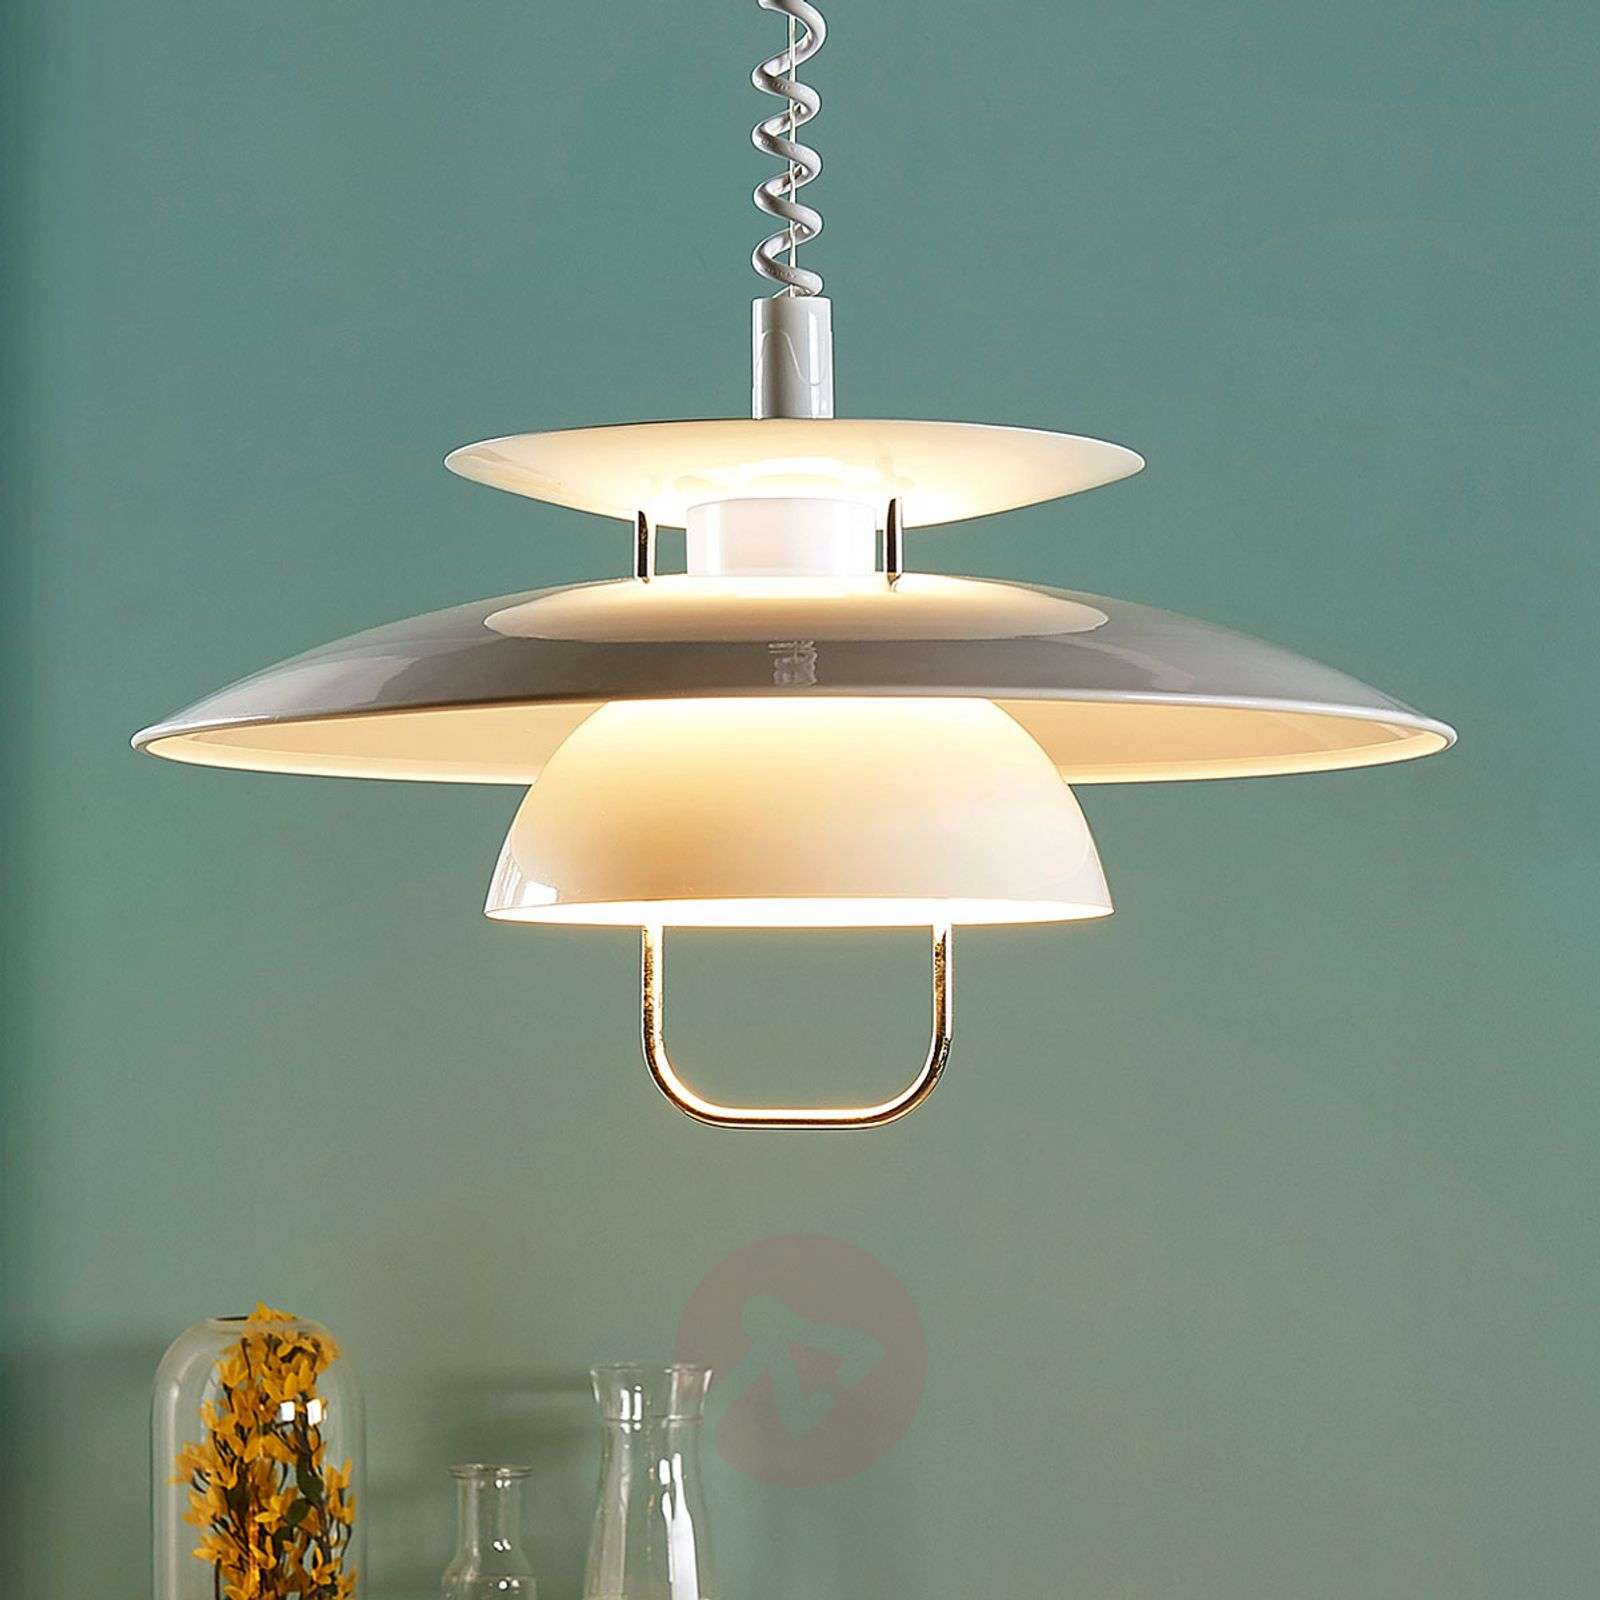 White kitchen hanging light Nadija-9621041-03